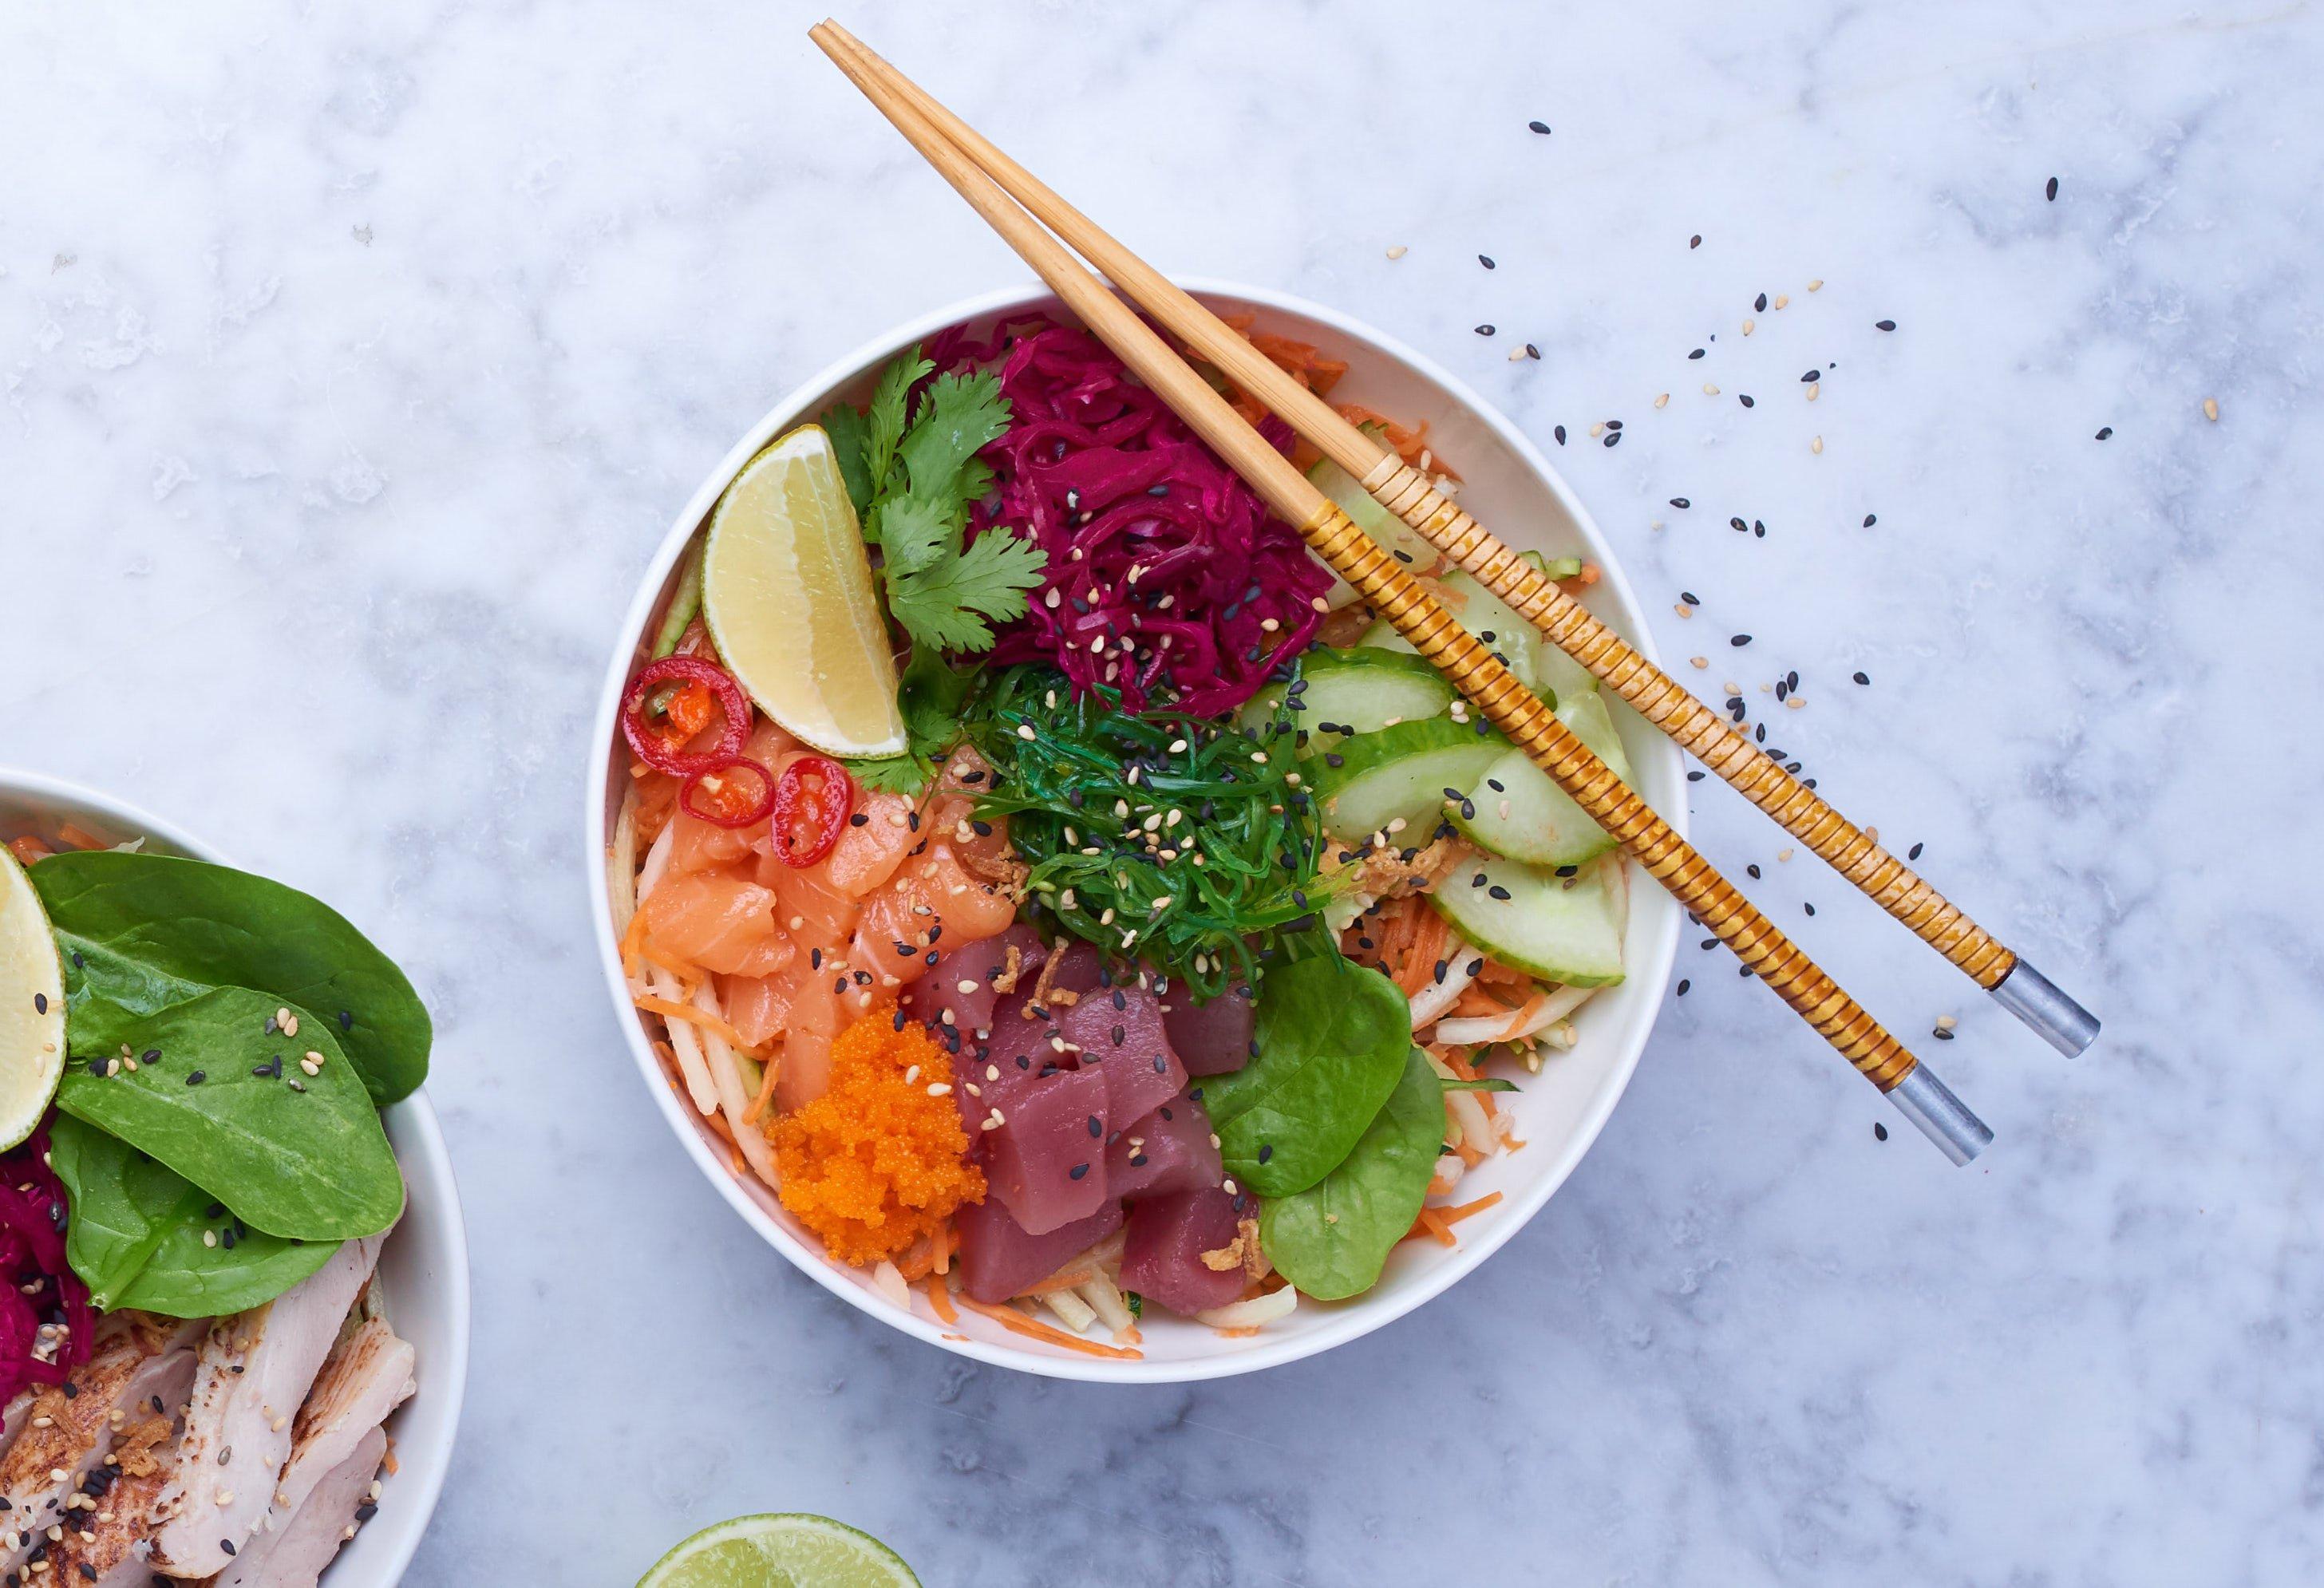 City Pantry - Abokado lunch menu - Tuna & Salmon Poke